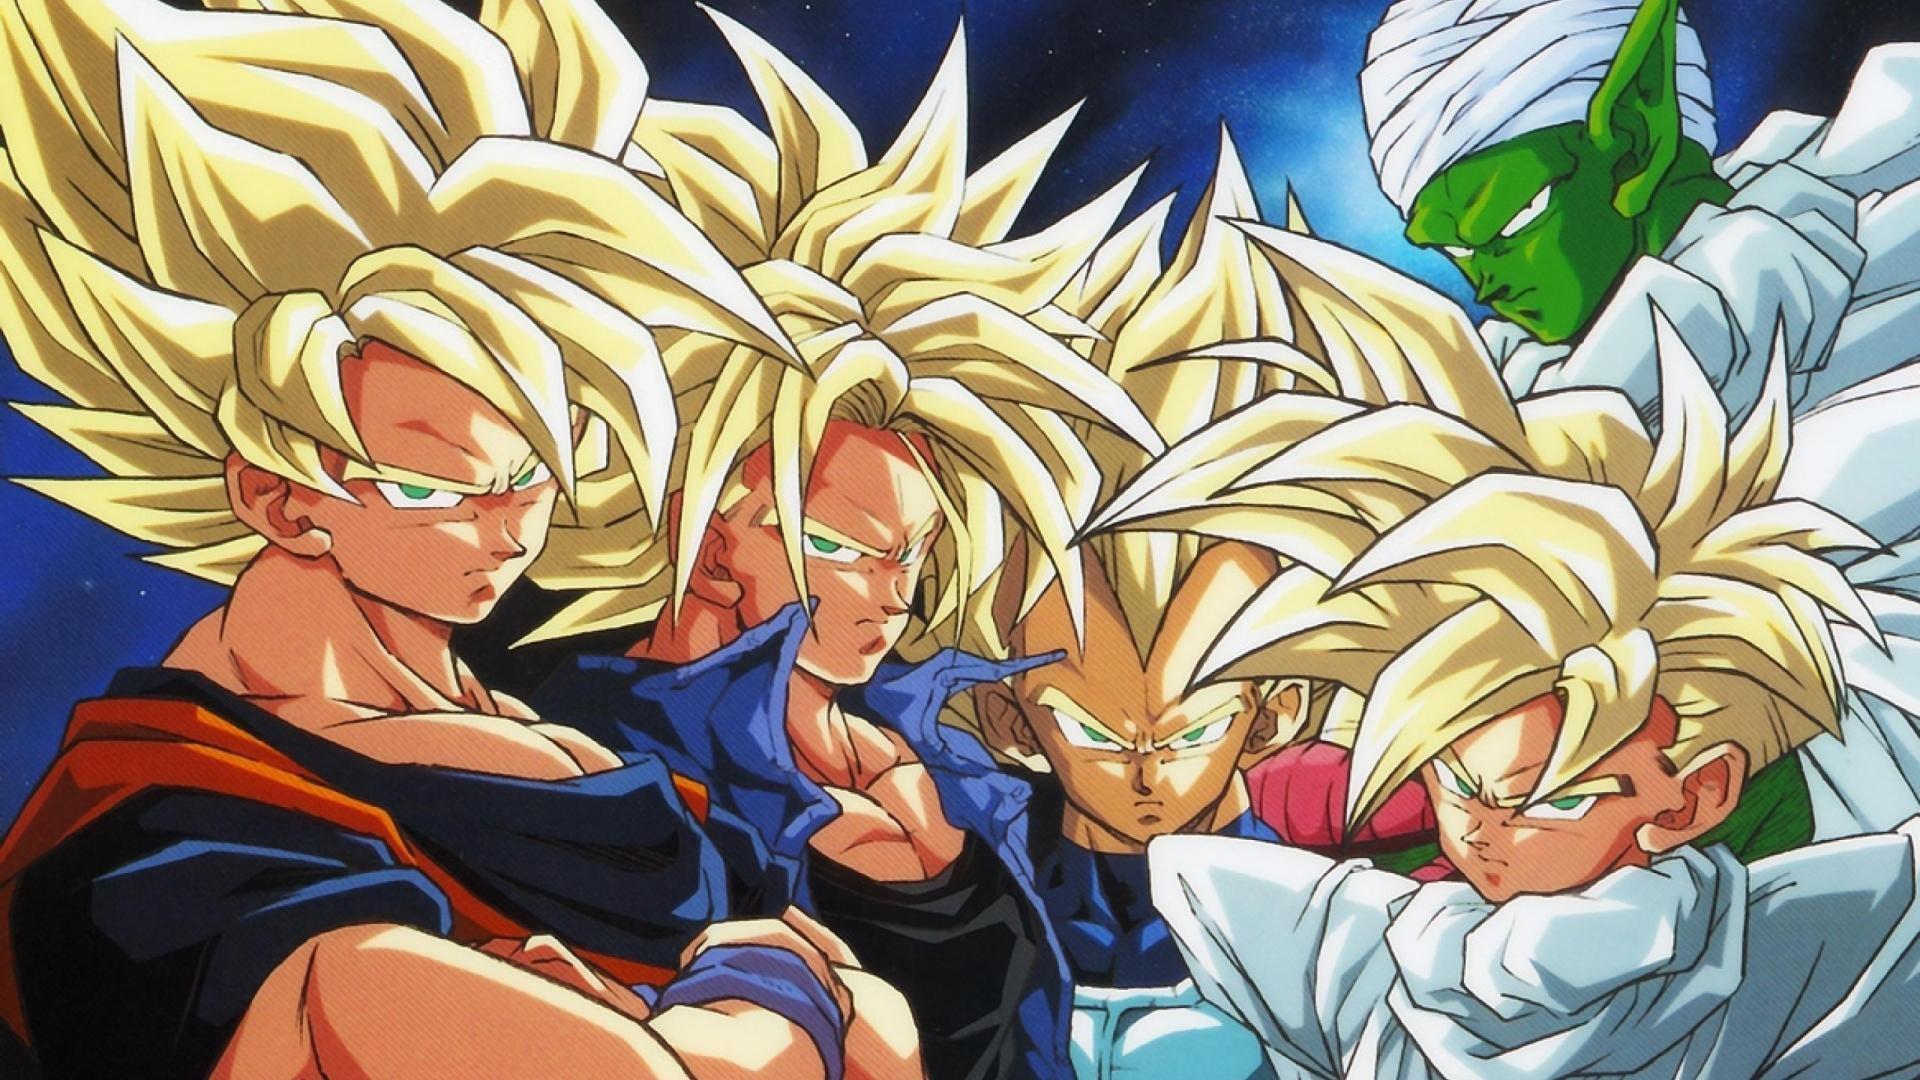 Wallpaper Illustration Anime Cartoon Son Goku Dragon Ball Z